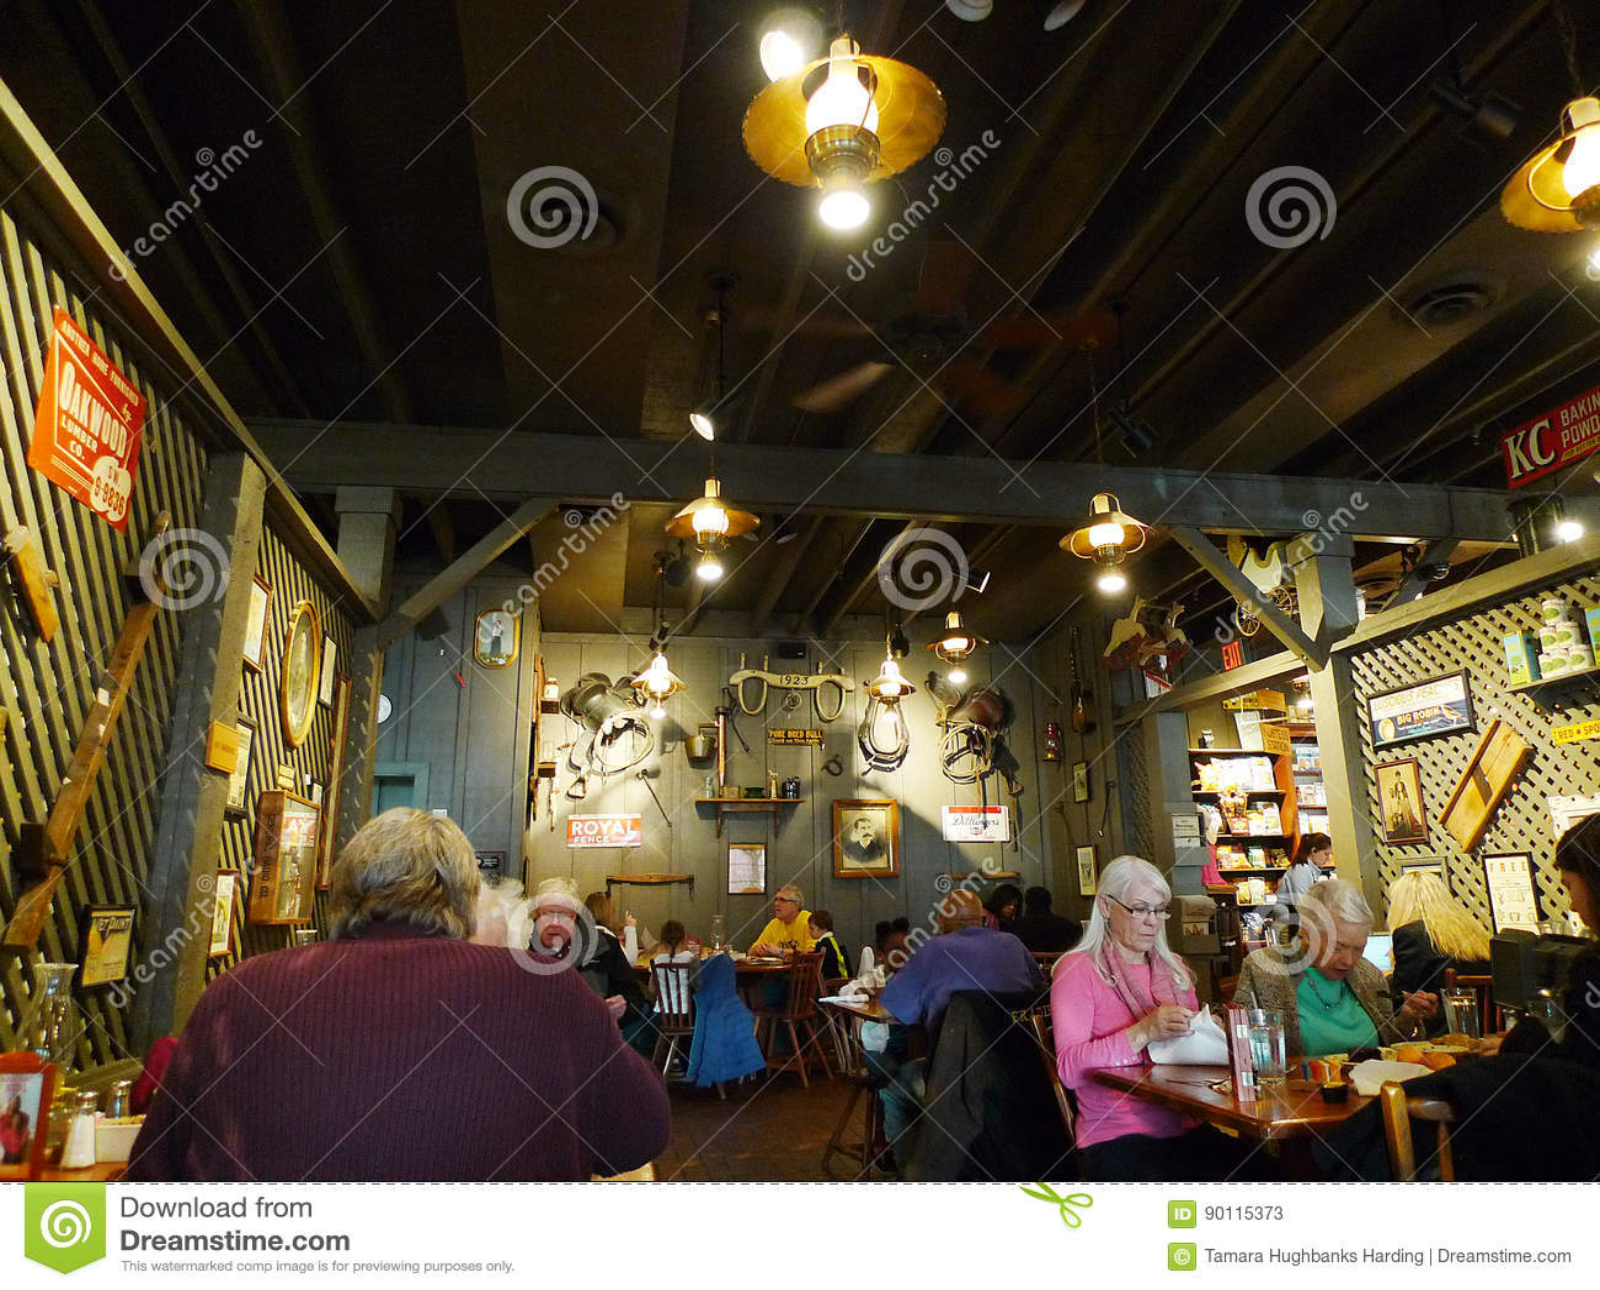 Cracker Barrel restaurant, people eating, Tulsa, OK